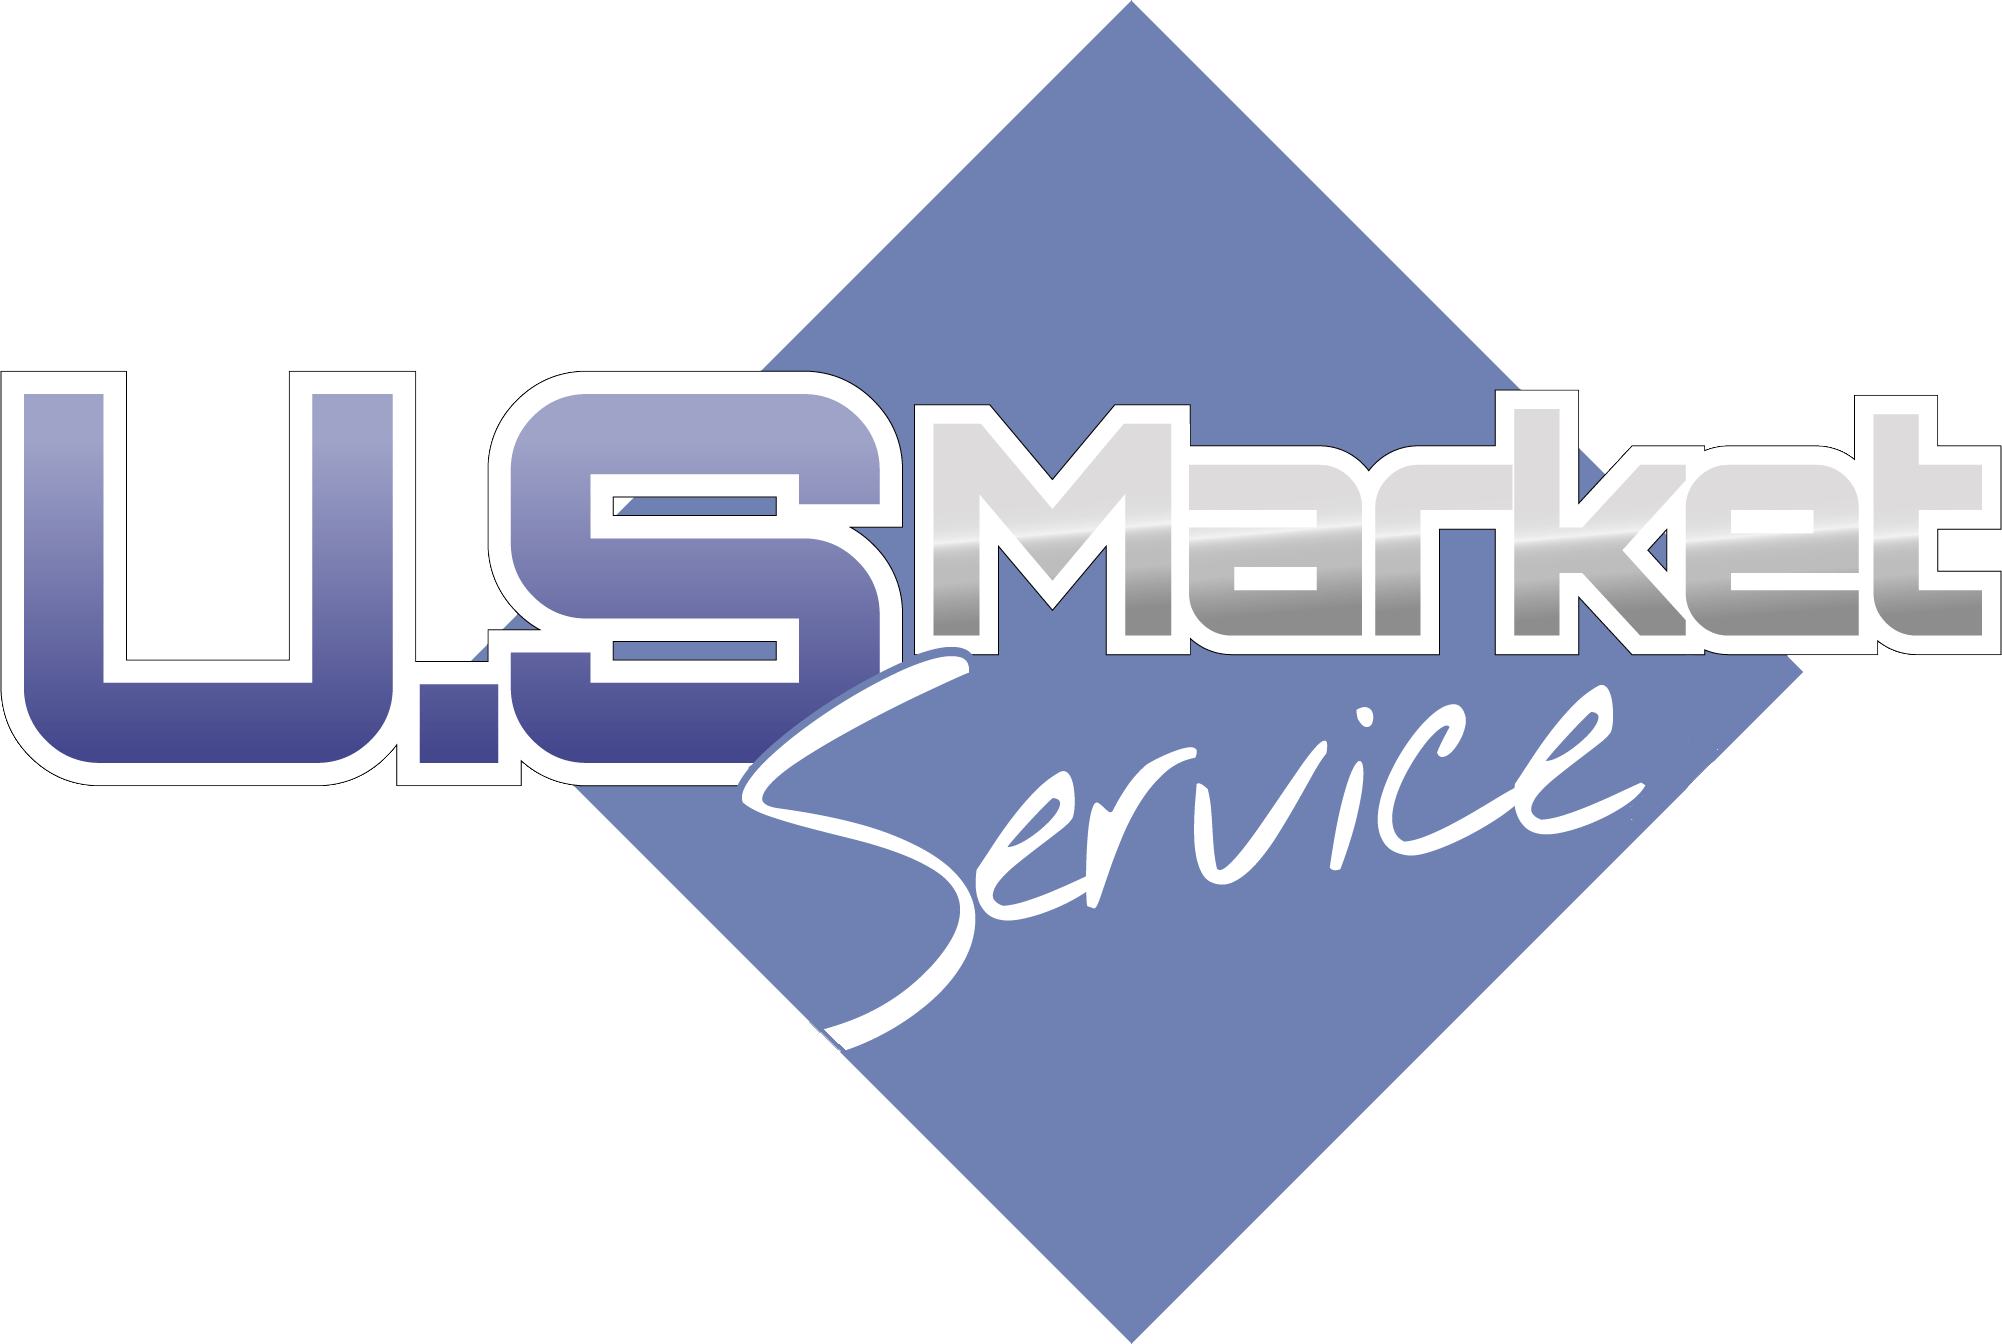 US MARKET SERVICE